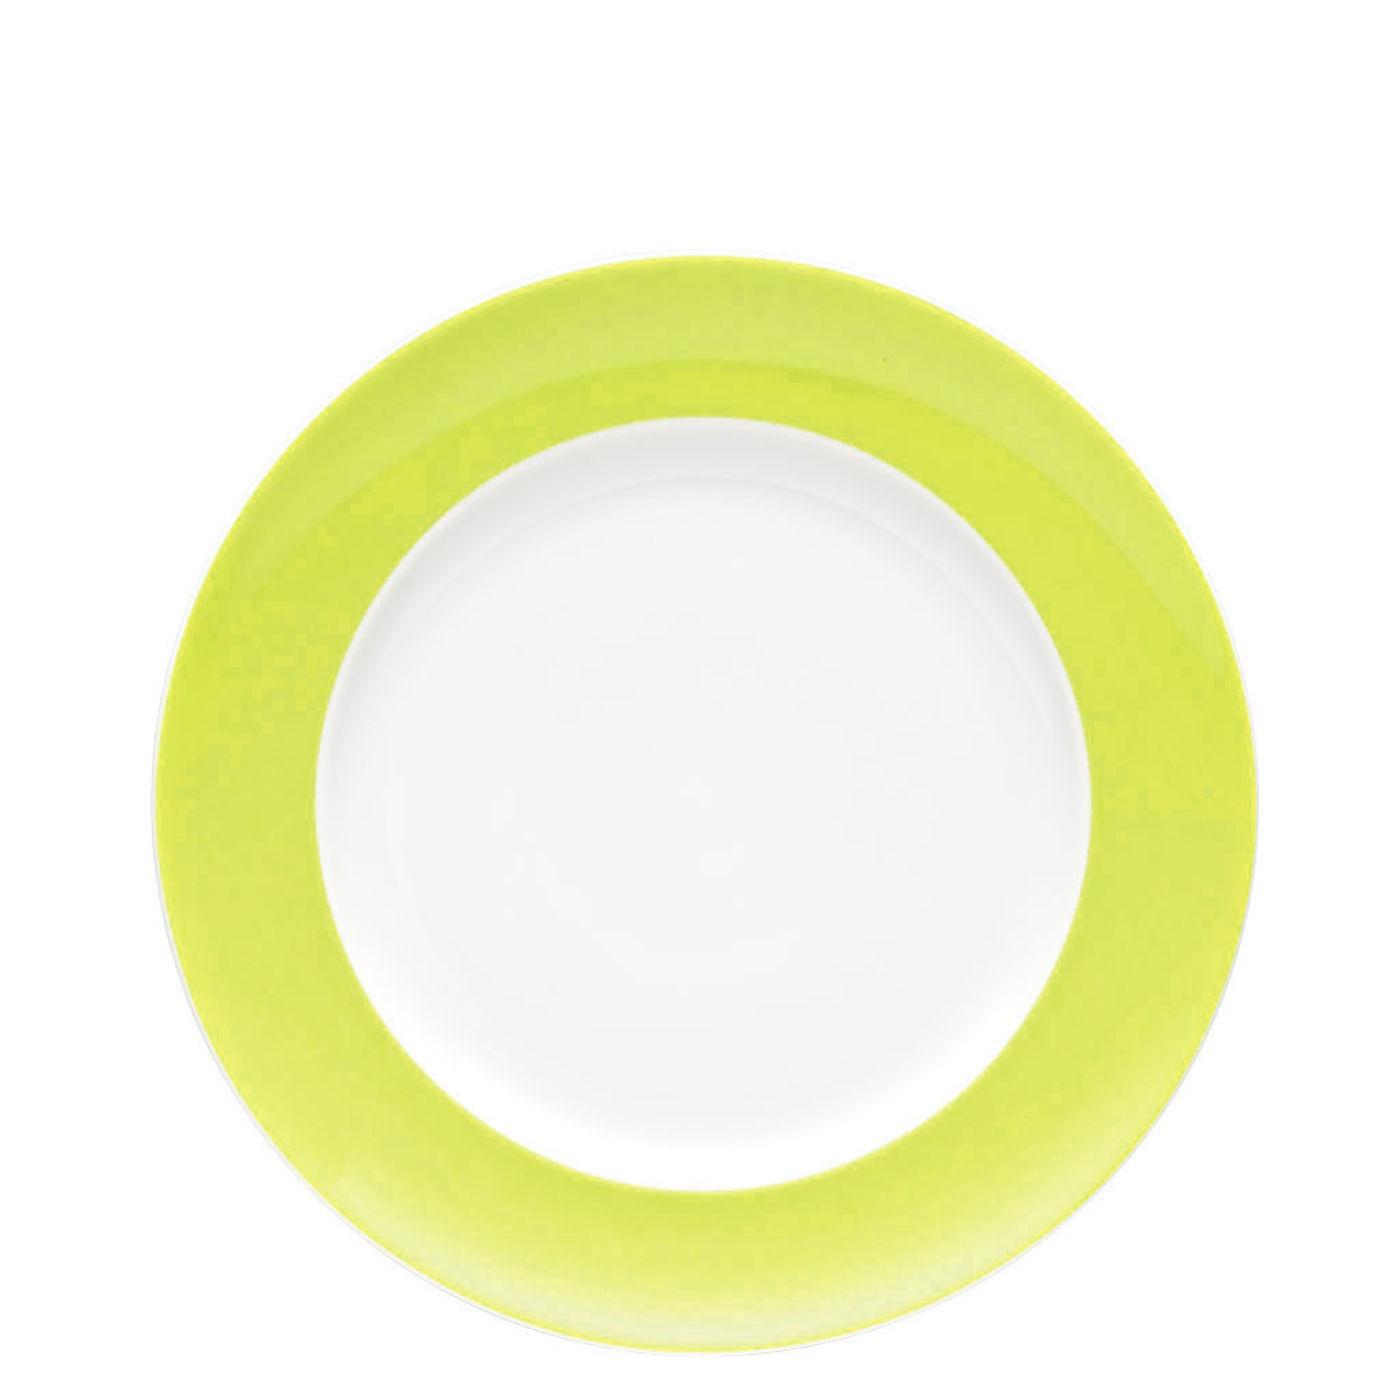 Набор столовый на 2 персоны Rosenthal SUNNY DAY, желтый, 10 предметов Rosenthal 10850-408535-28010 фото 1